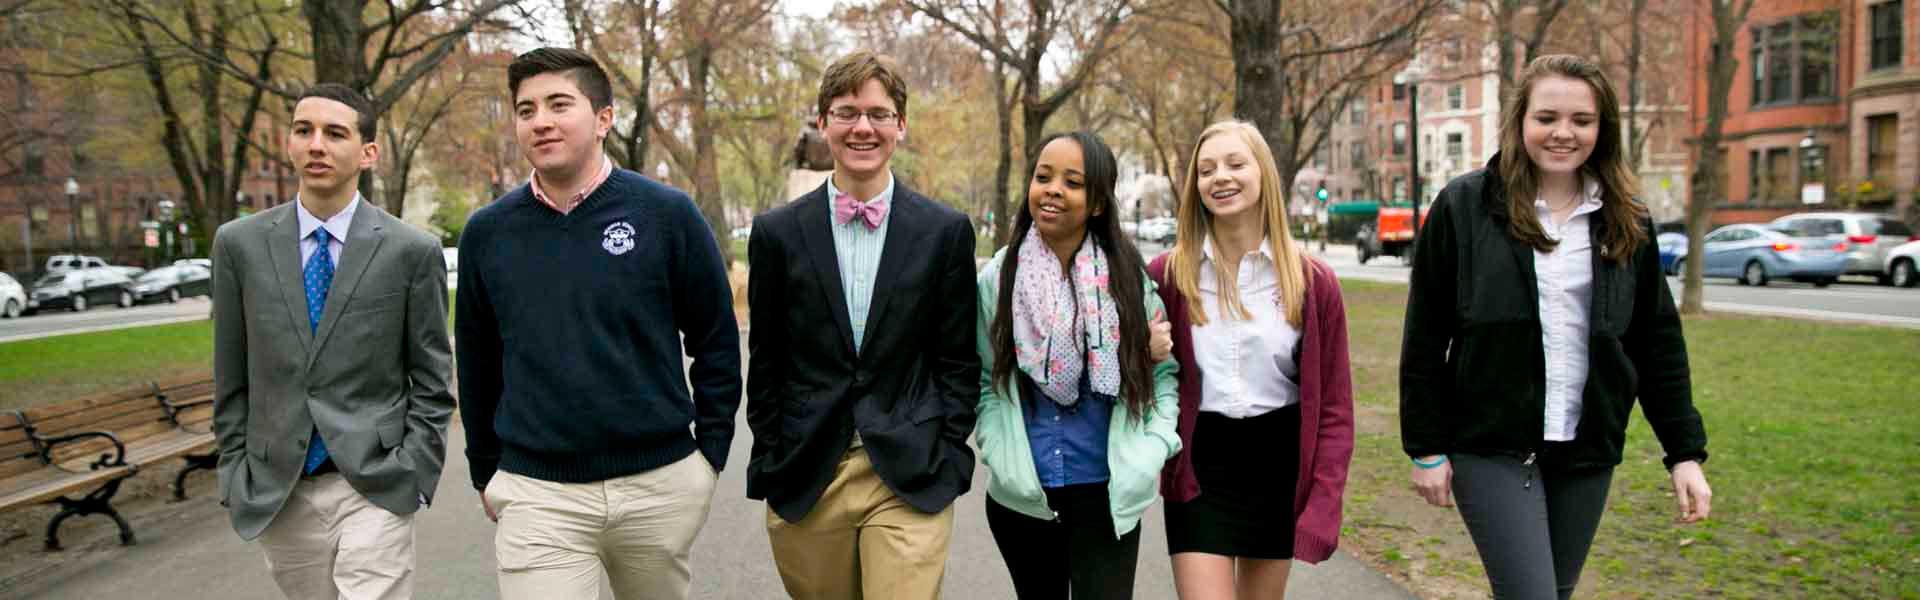 Newman-Highschool-MA-Students-Main-BAnner